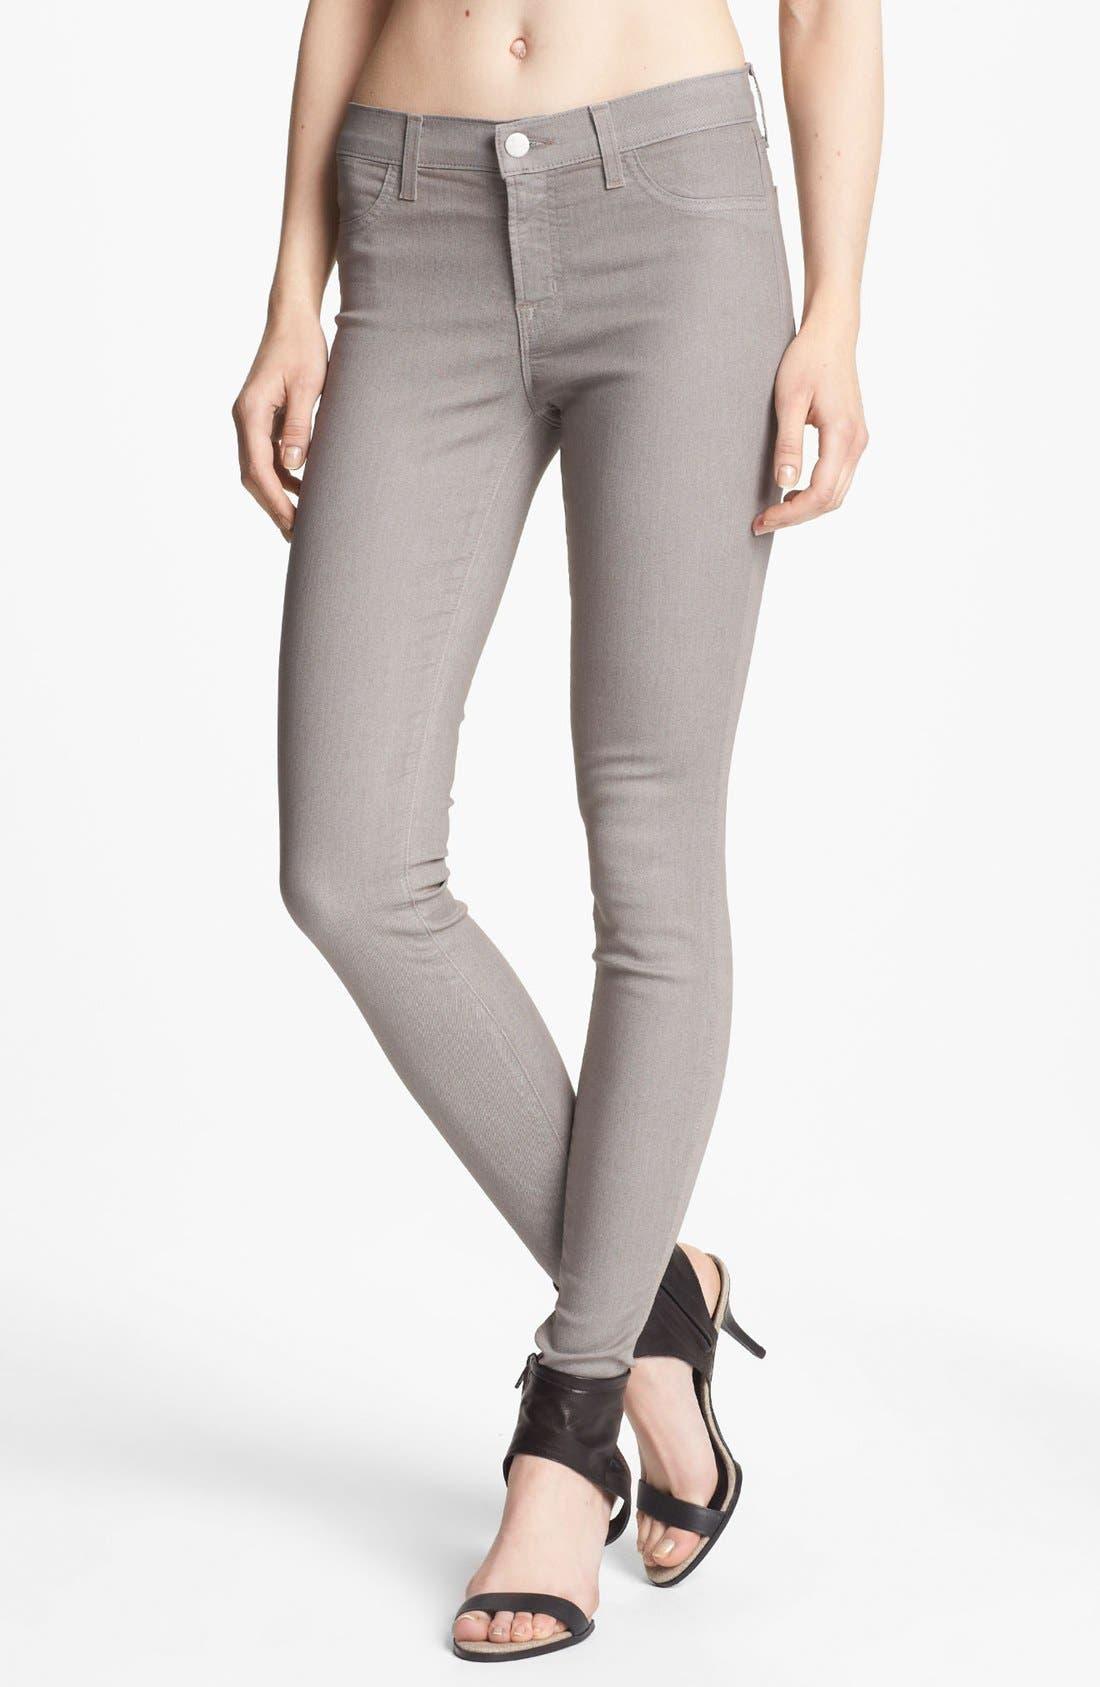 Alternate Image 1 Selected - J Brand Coated Metallic Skinny Jeans (Coated Limestone)